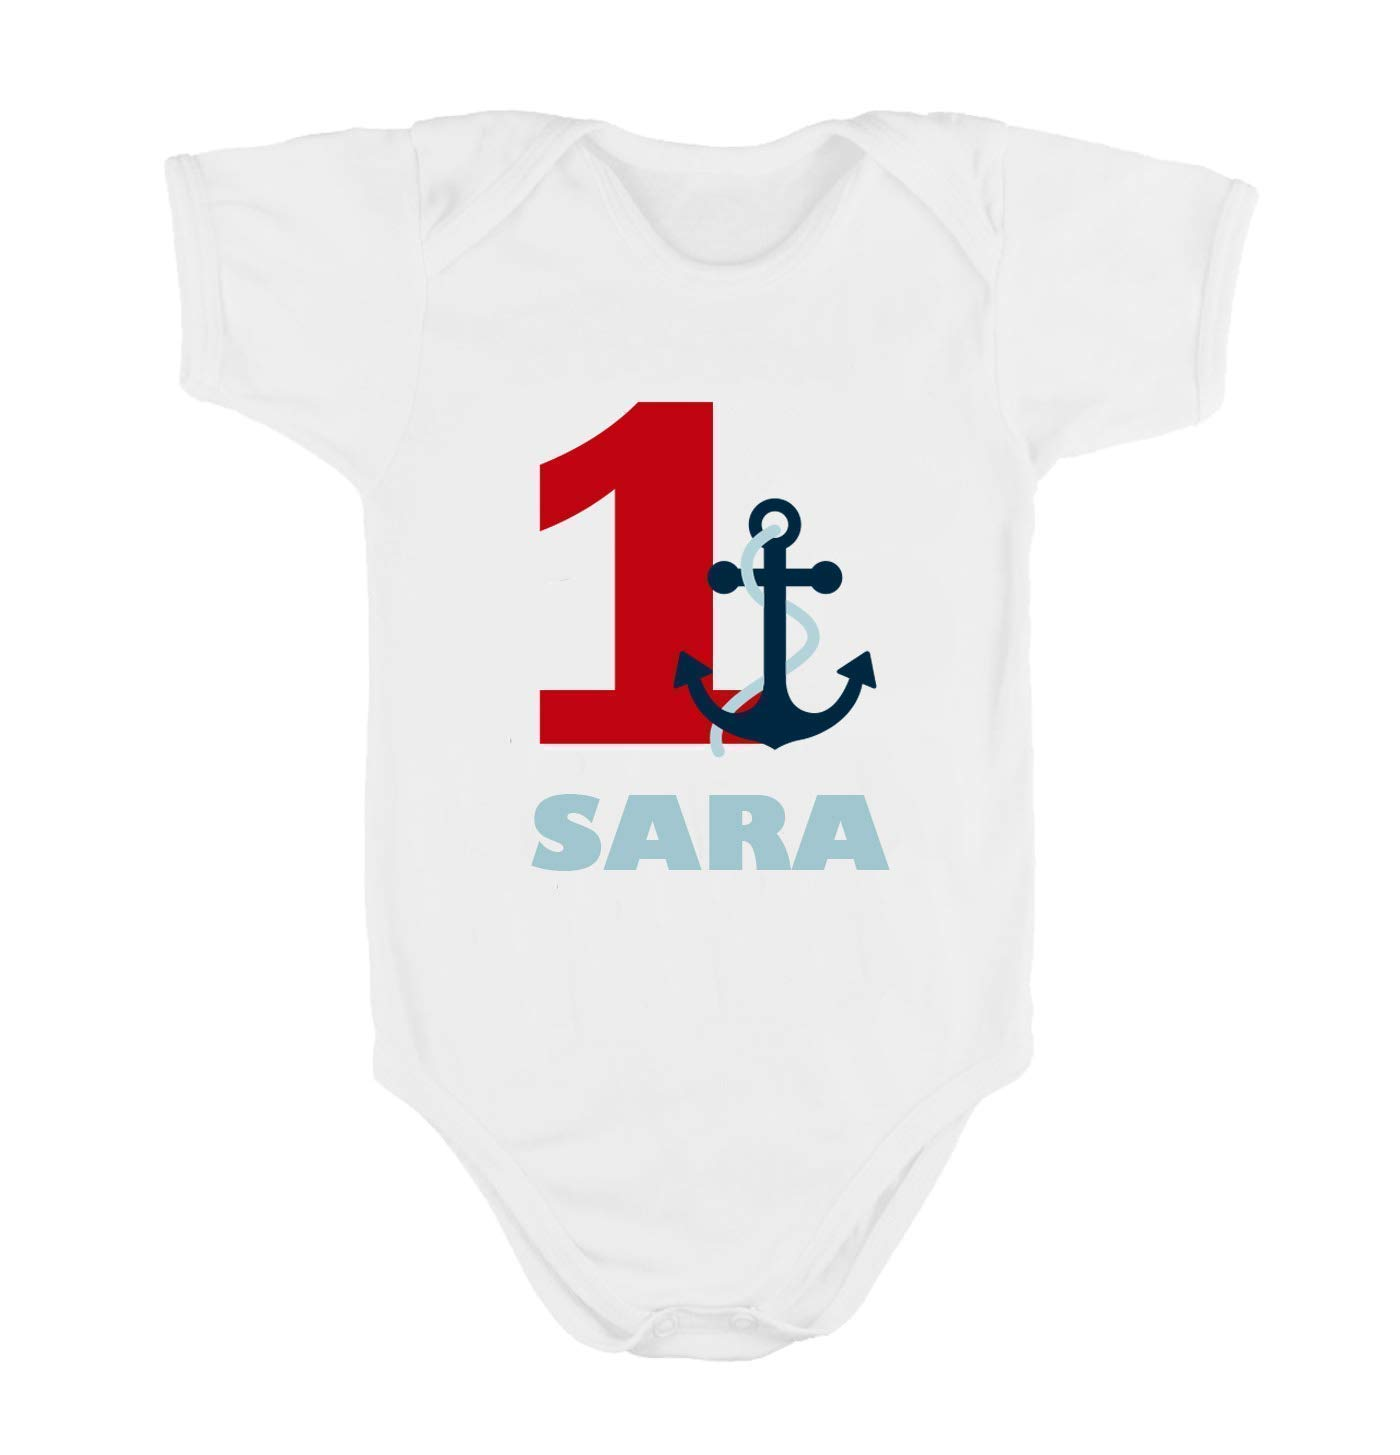 Body o Camiseta Primer / 1er Cumpleañ os 1 añ o Marinero para Bebes Niñ as Personalizado con el Nombre